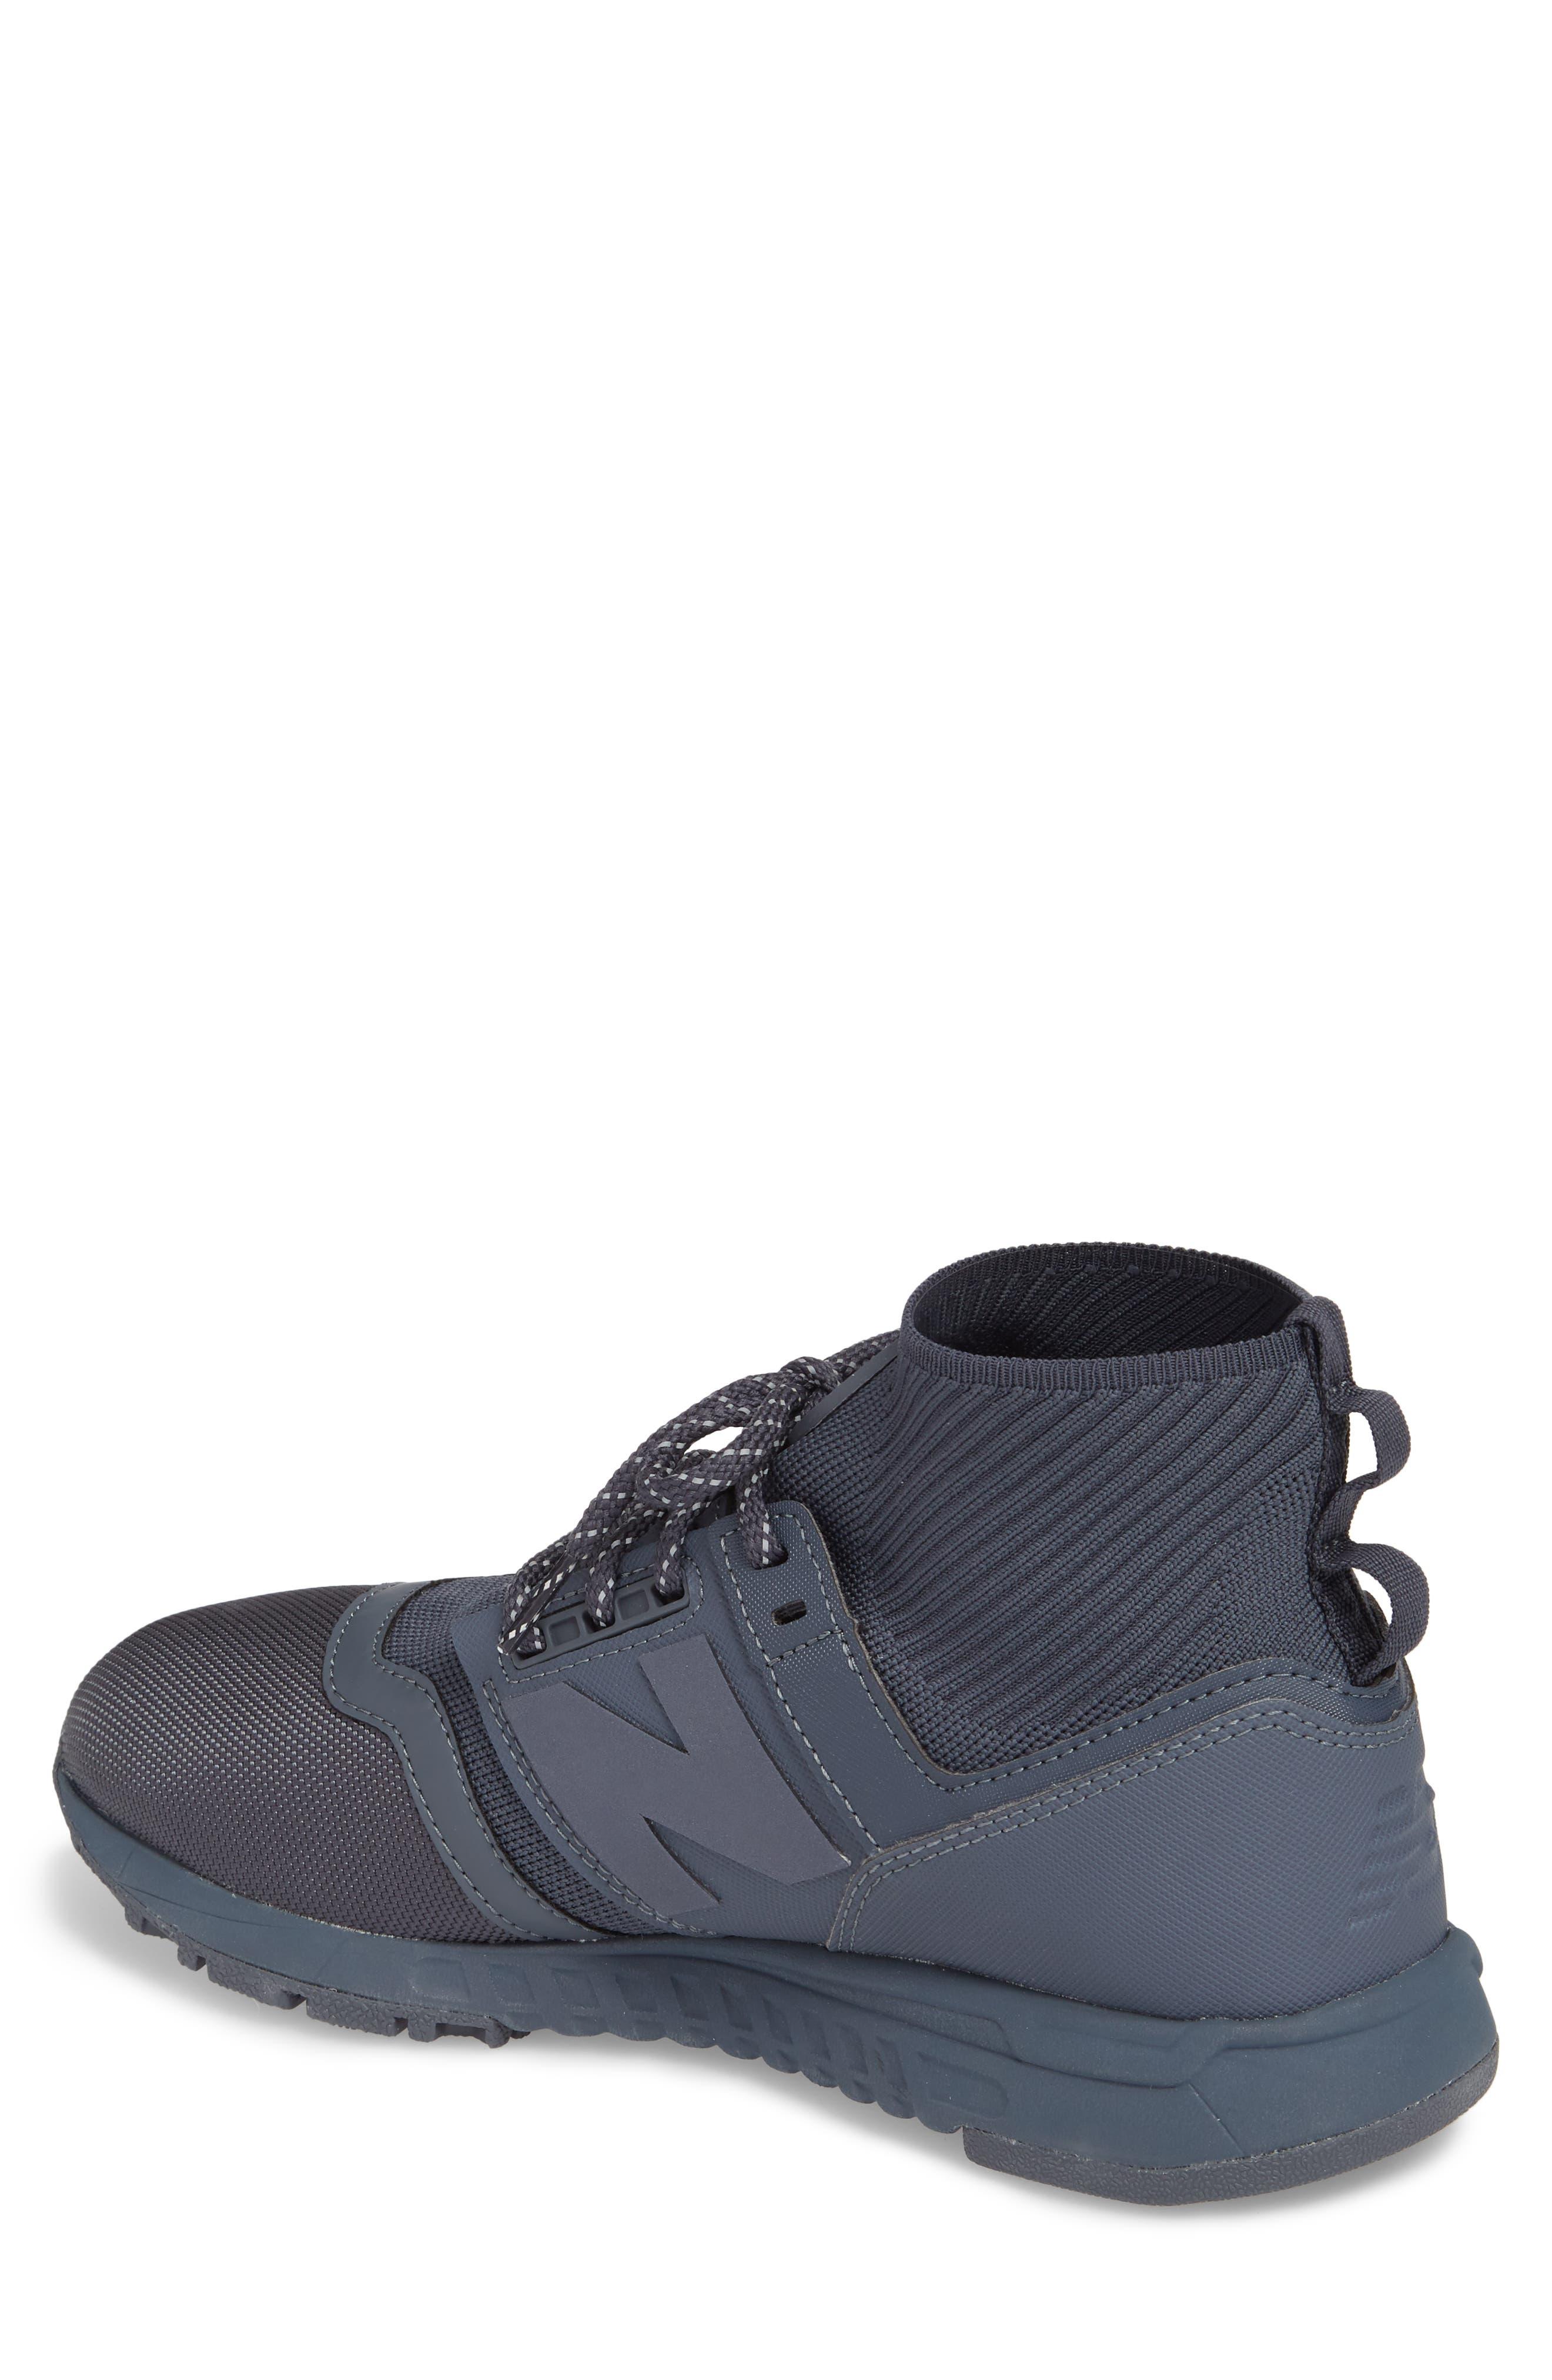 247 Mid Sneaker,                             Alternate thumbnail 8, color,